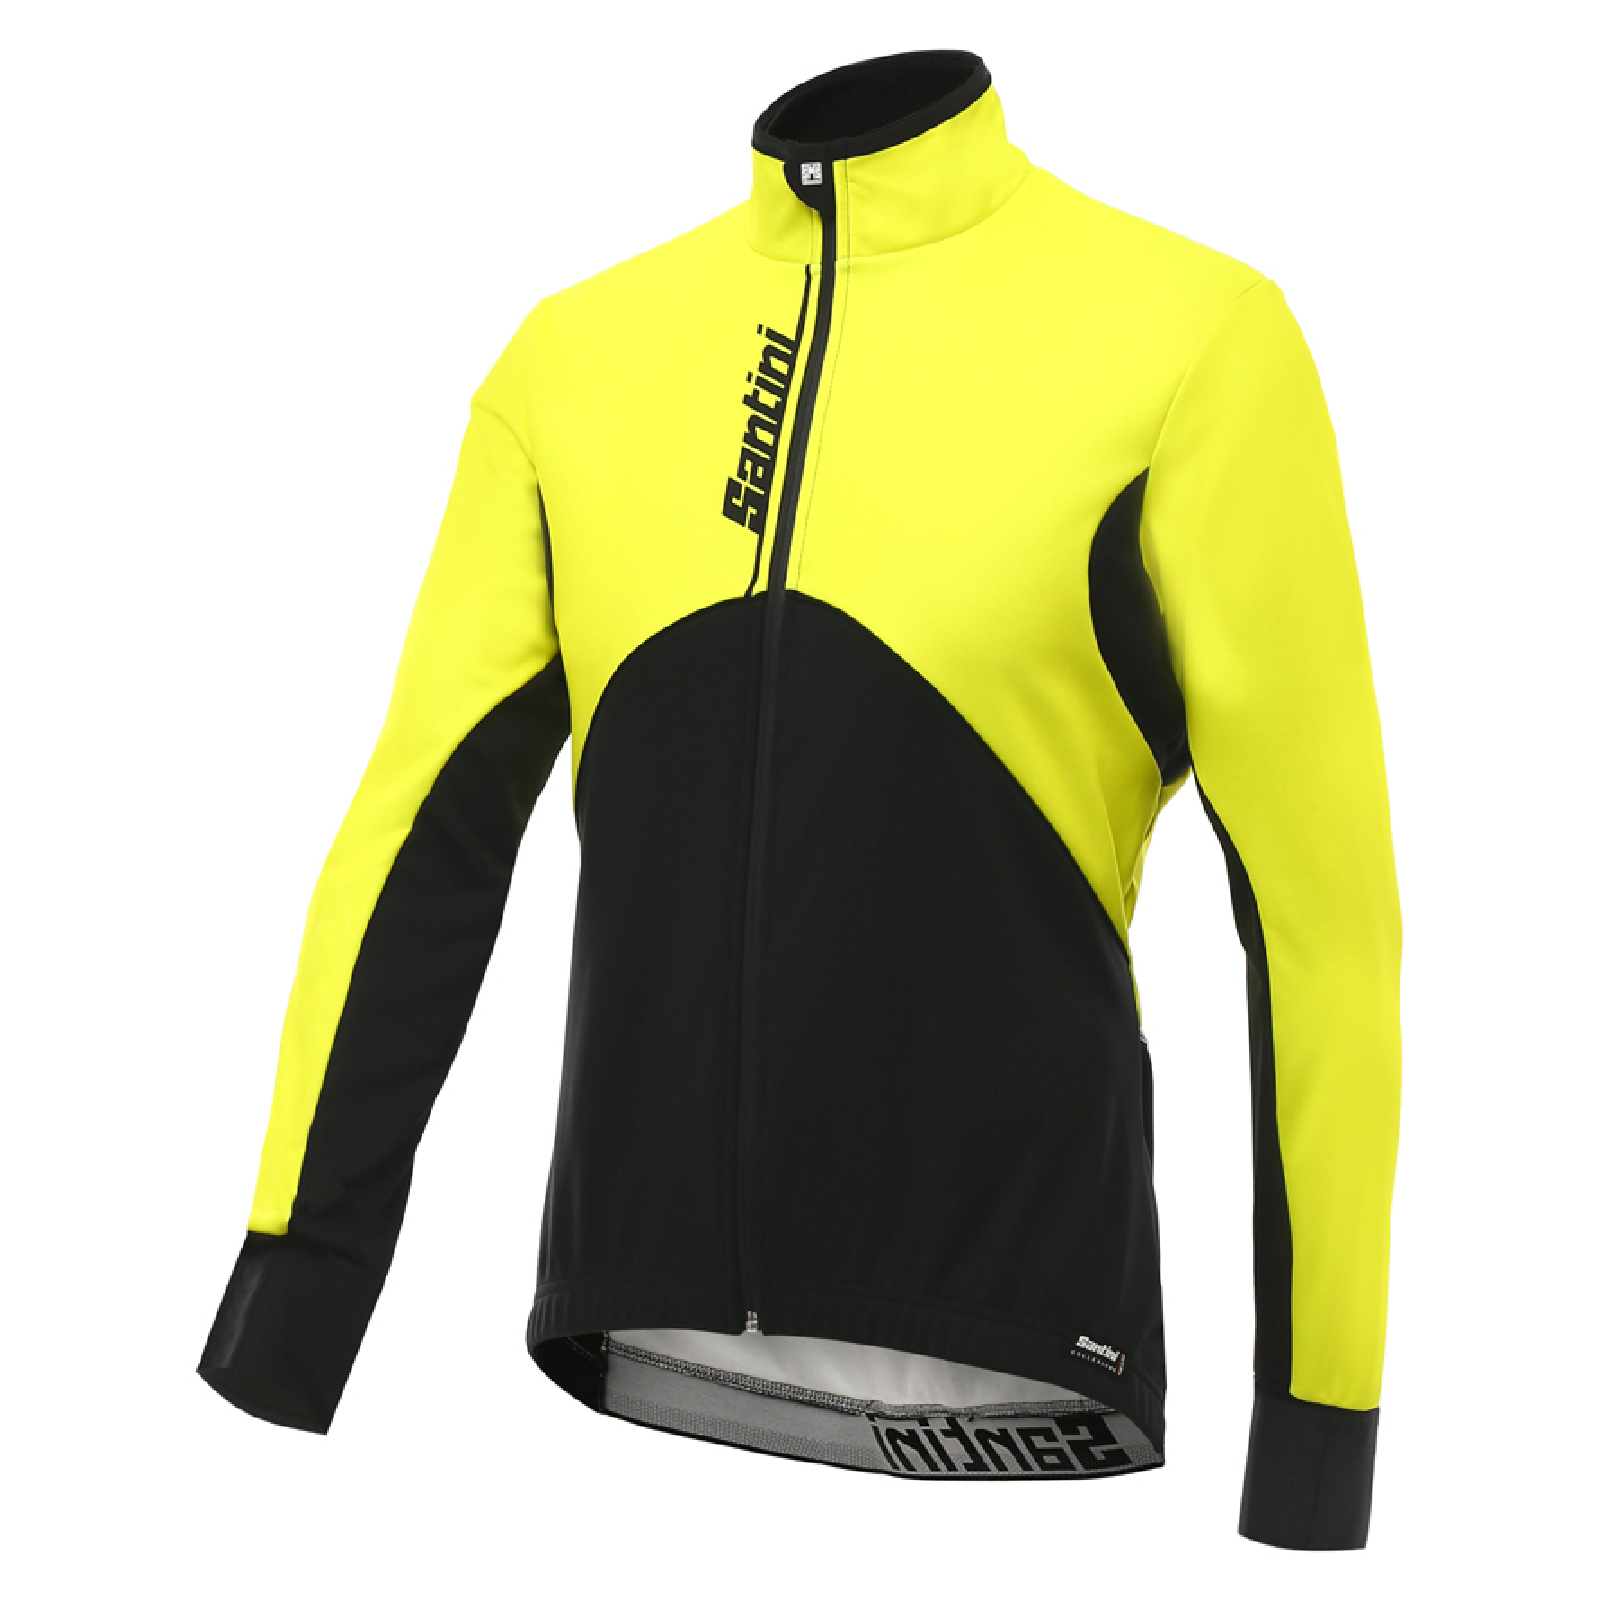 5341d8452b426 Santini Impero Winter Jacket - Yellow | ProBikeKit.com